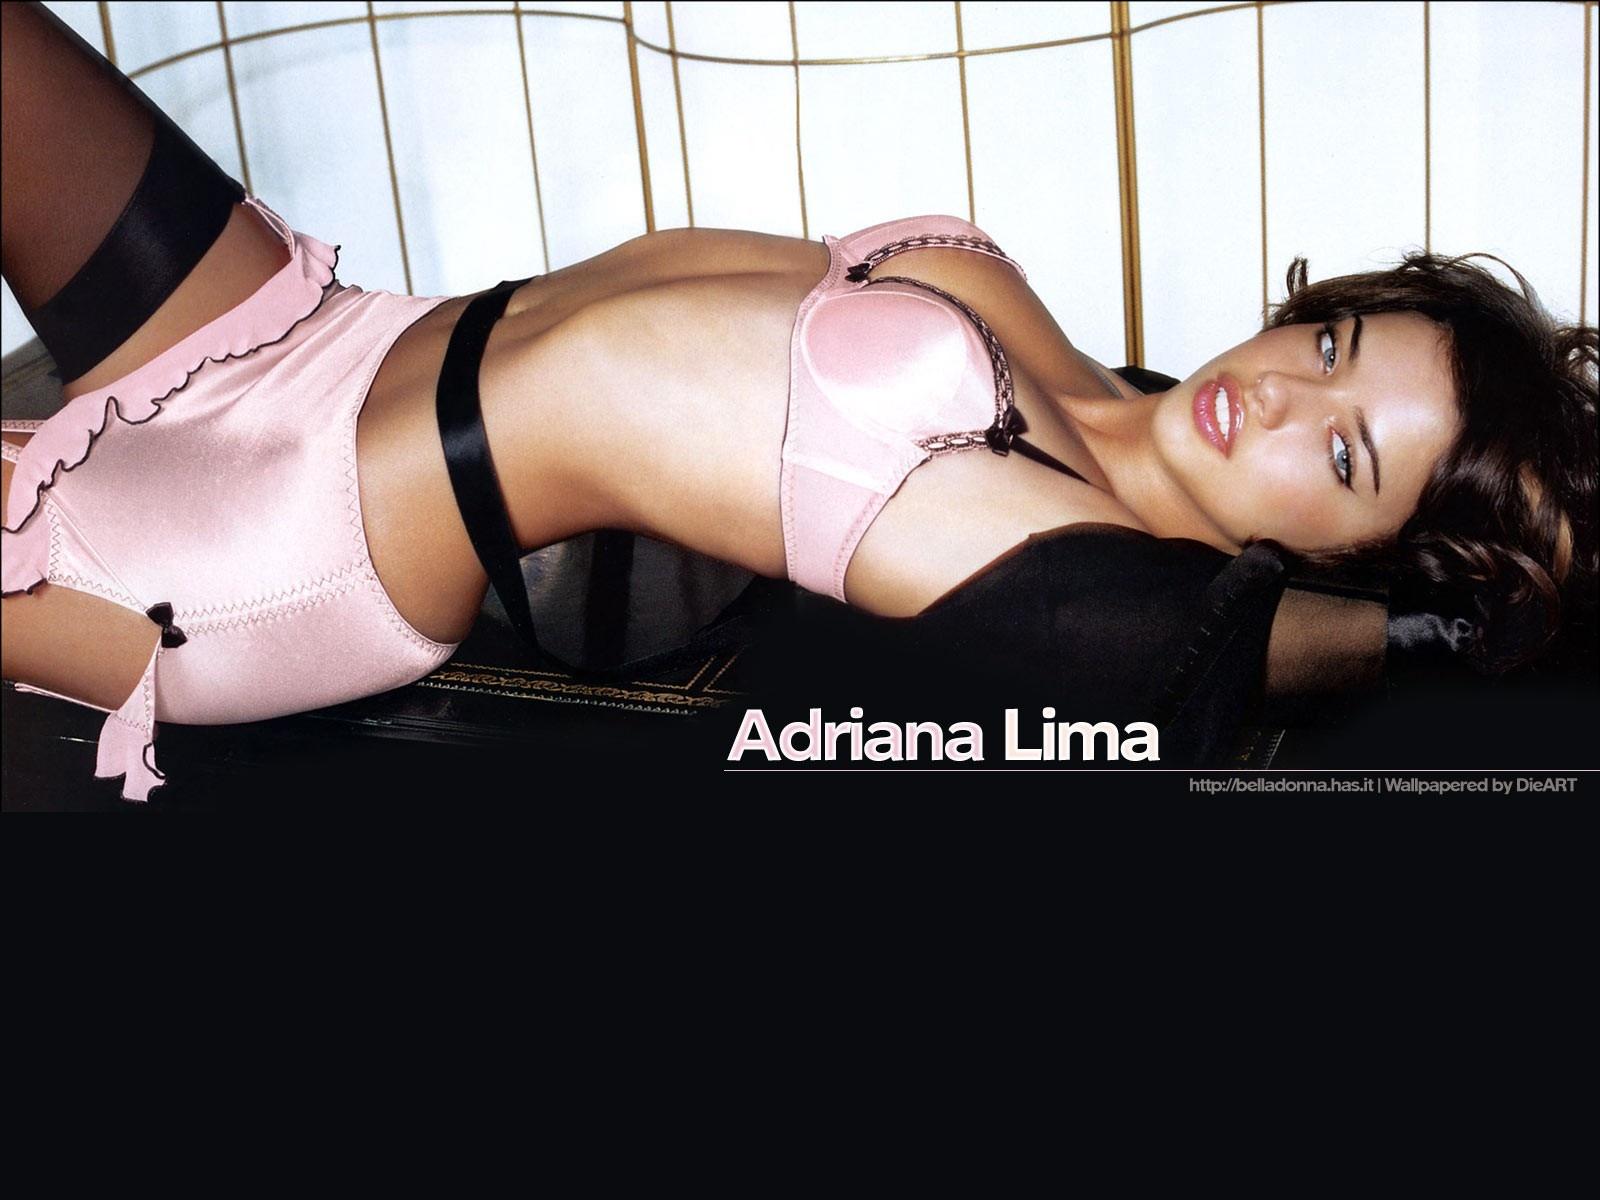 http://1.bp.blogspot.com/-_ZNLuWeRNP8/Tdb-3qHNFaI/AAAAAAAAAT0/0_gU7jKb5Fk/s1600/Adriana-Lima-412.jpg